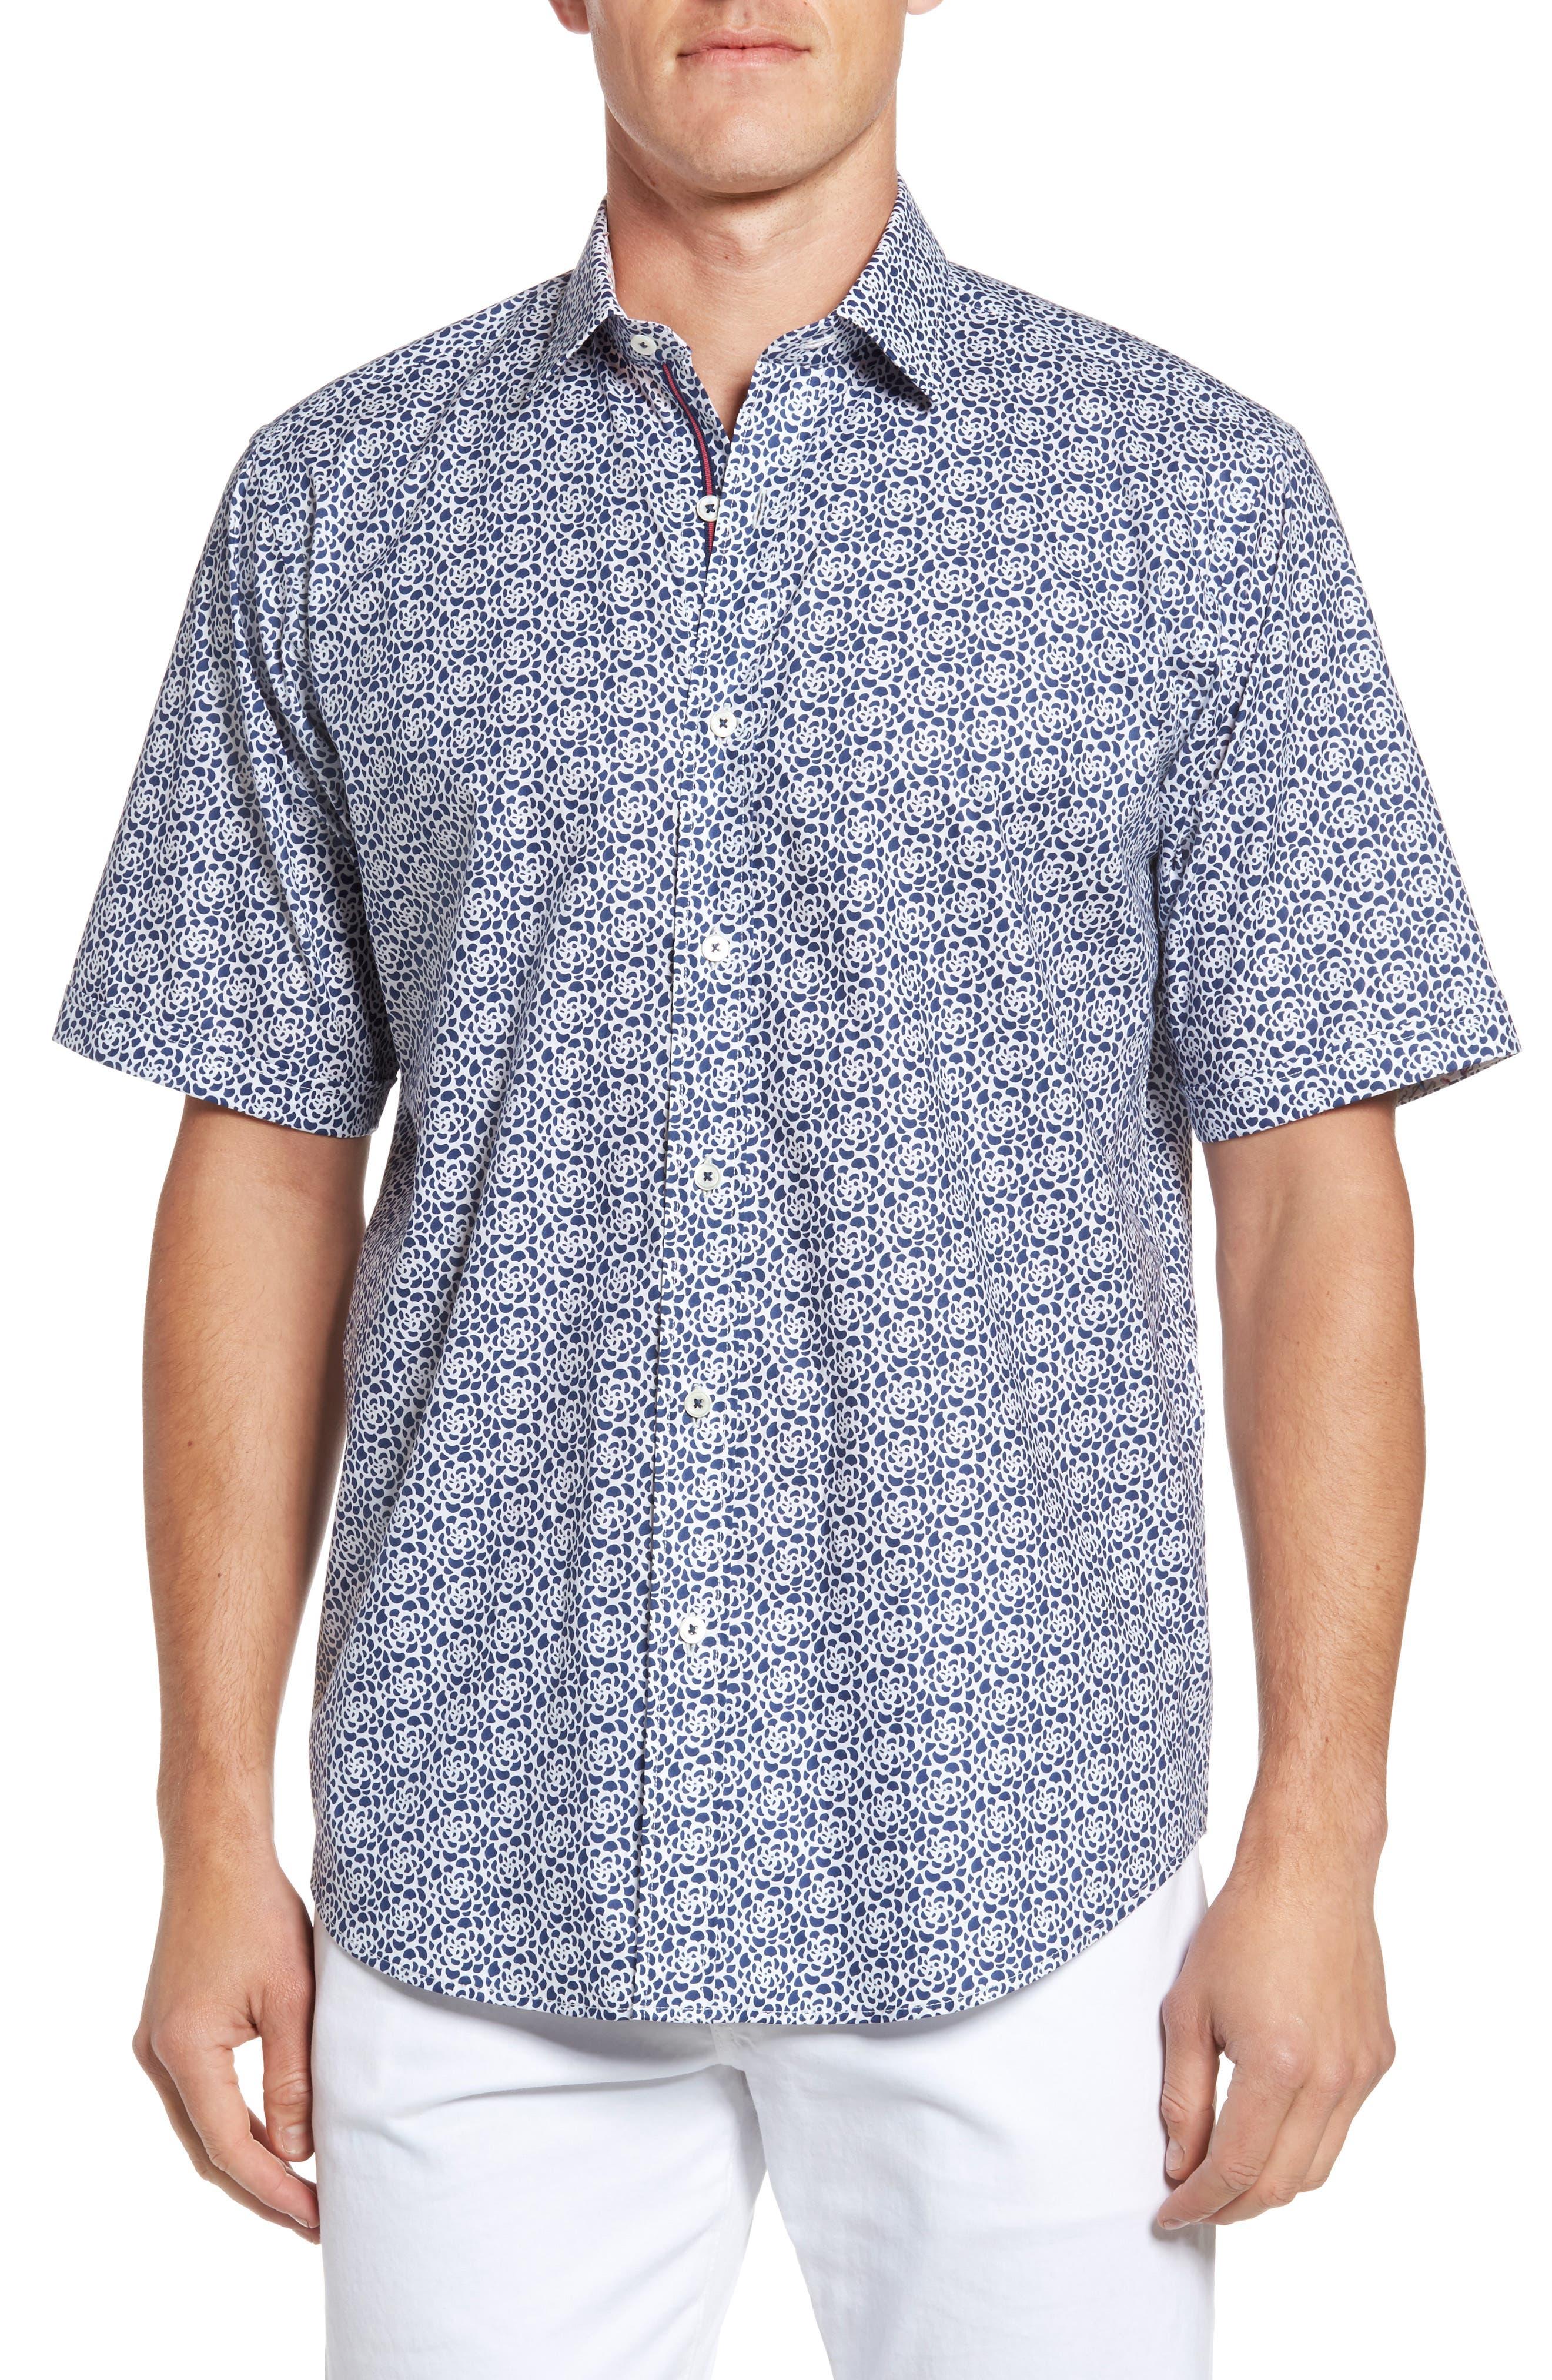 Main Image - Bugatchi Classic Fit Print Short Sleeve Sport Shirt